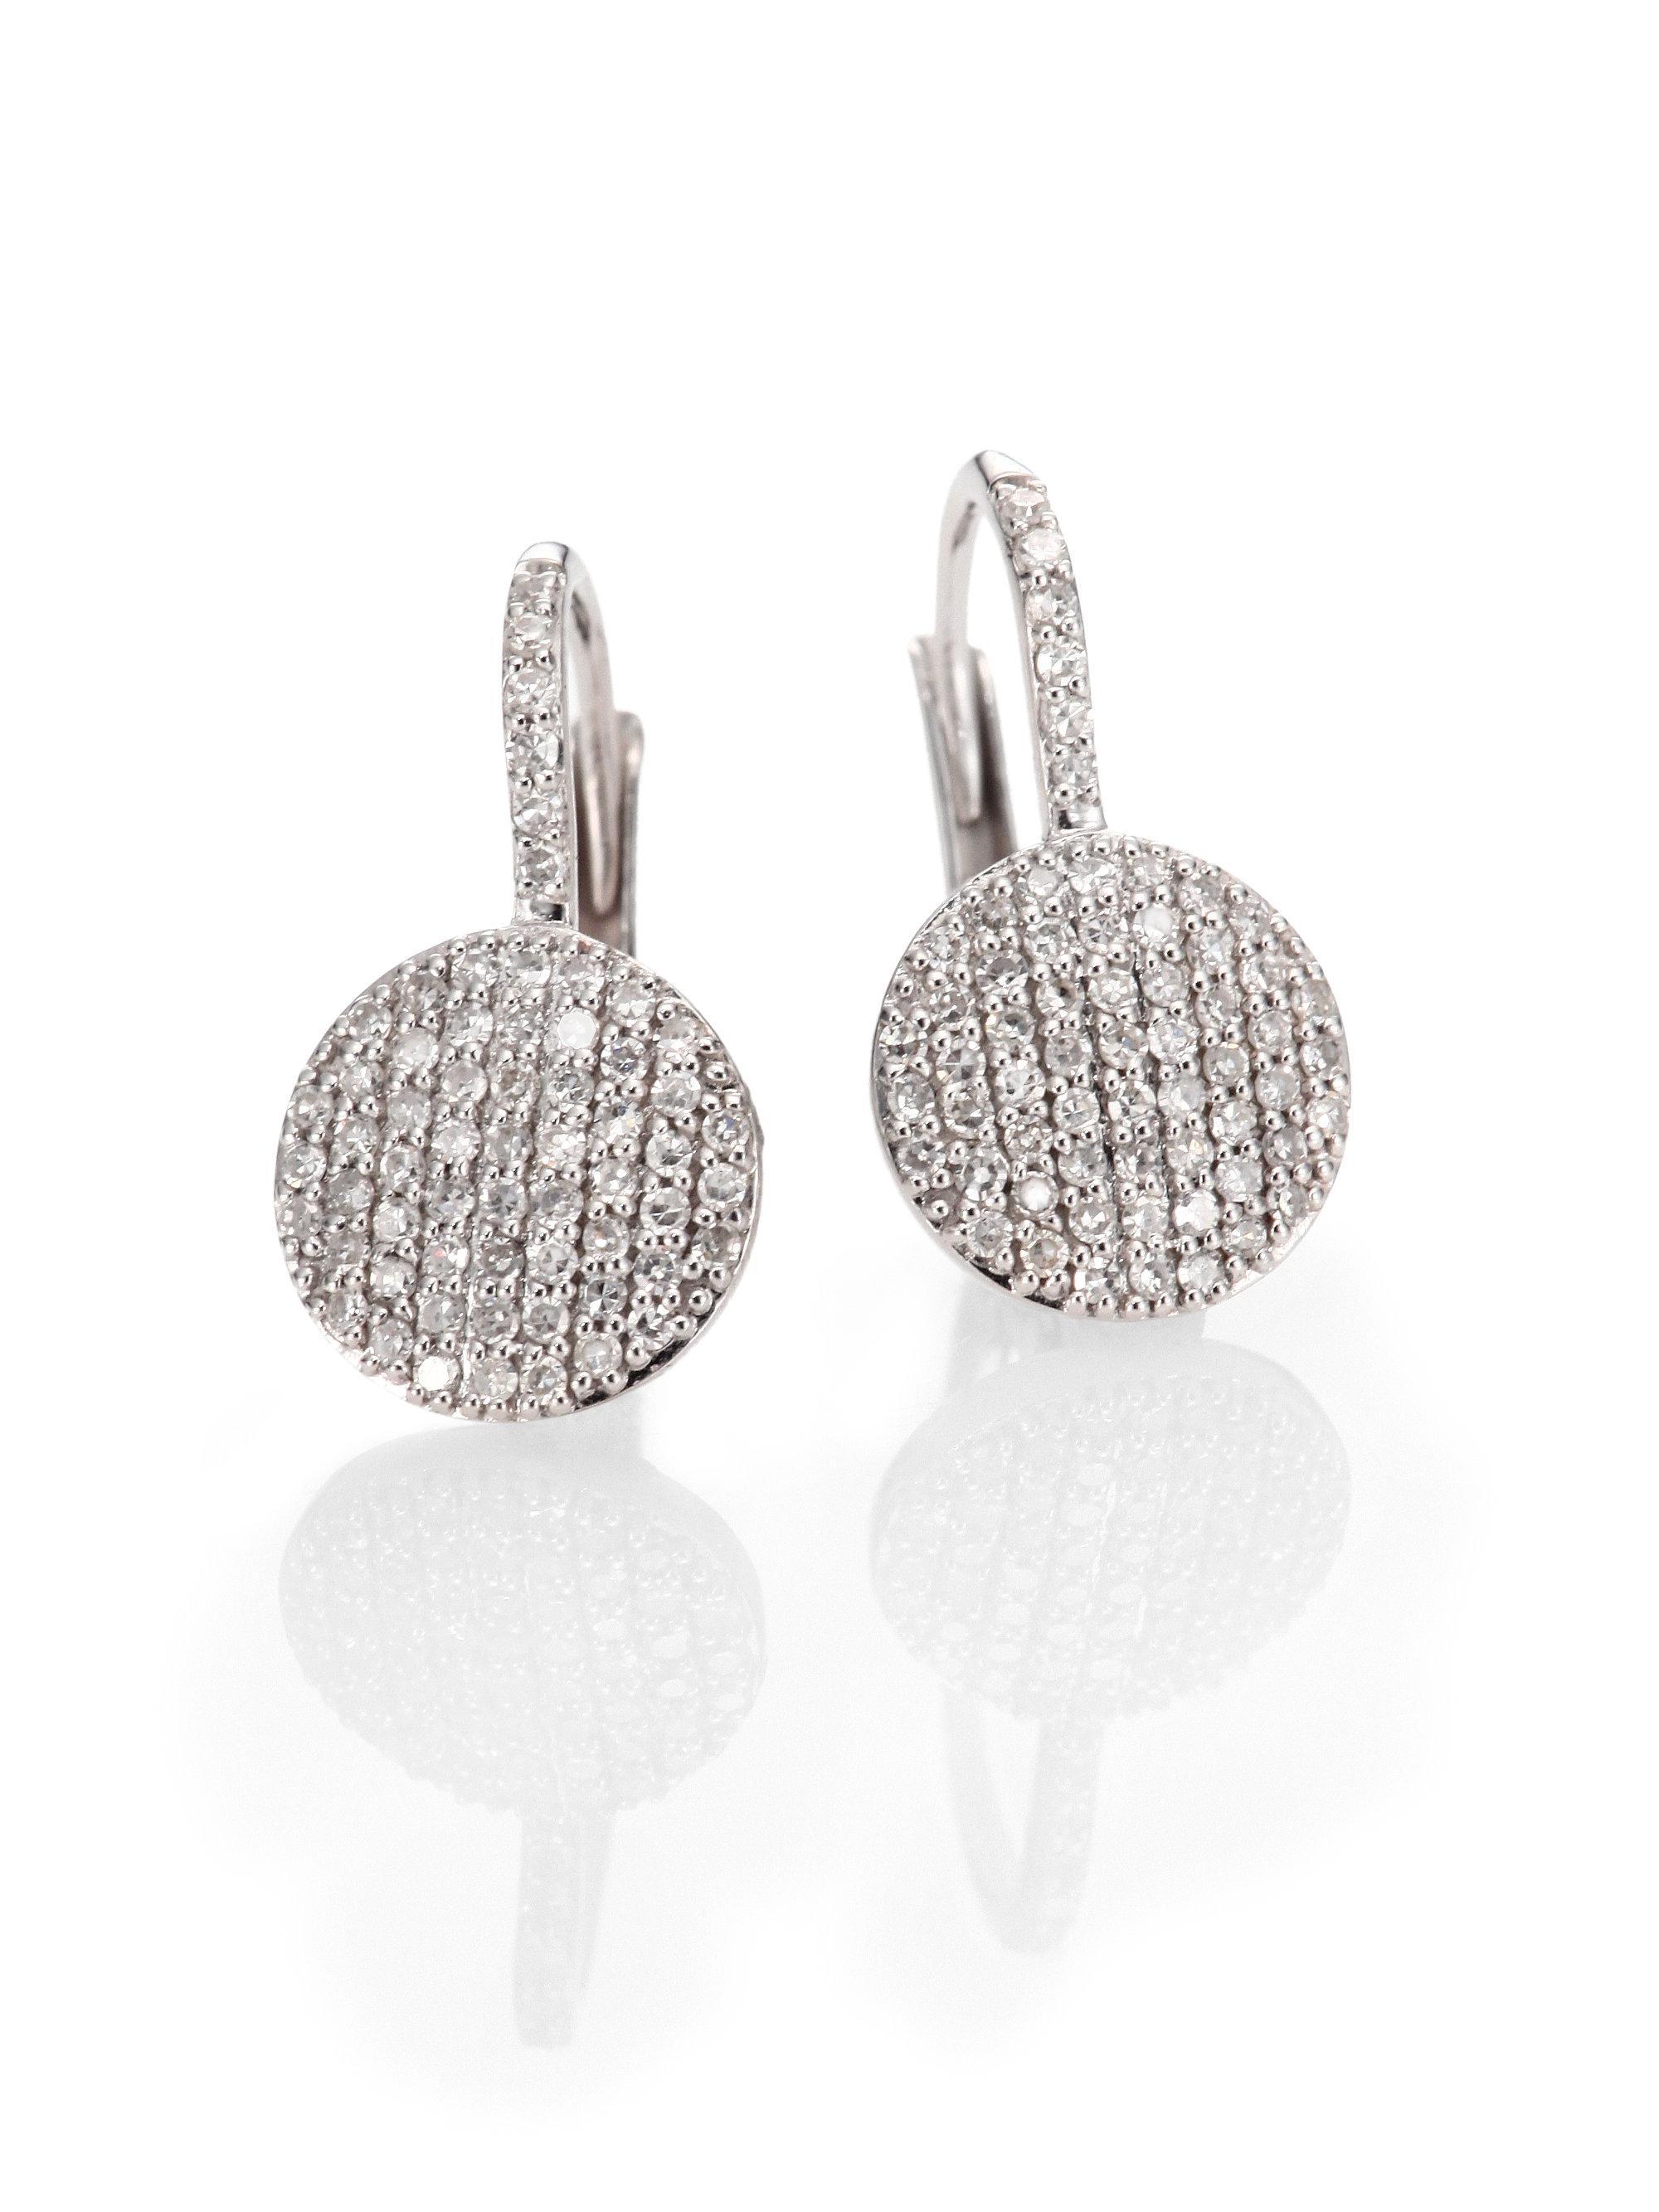 Phillips House Diamond & 14k White Gold Disc Drop Earrings in